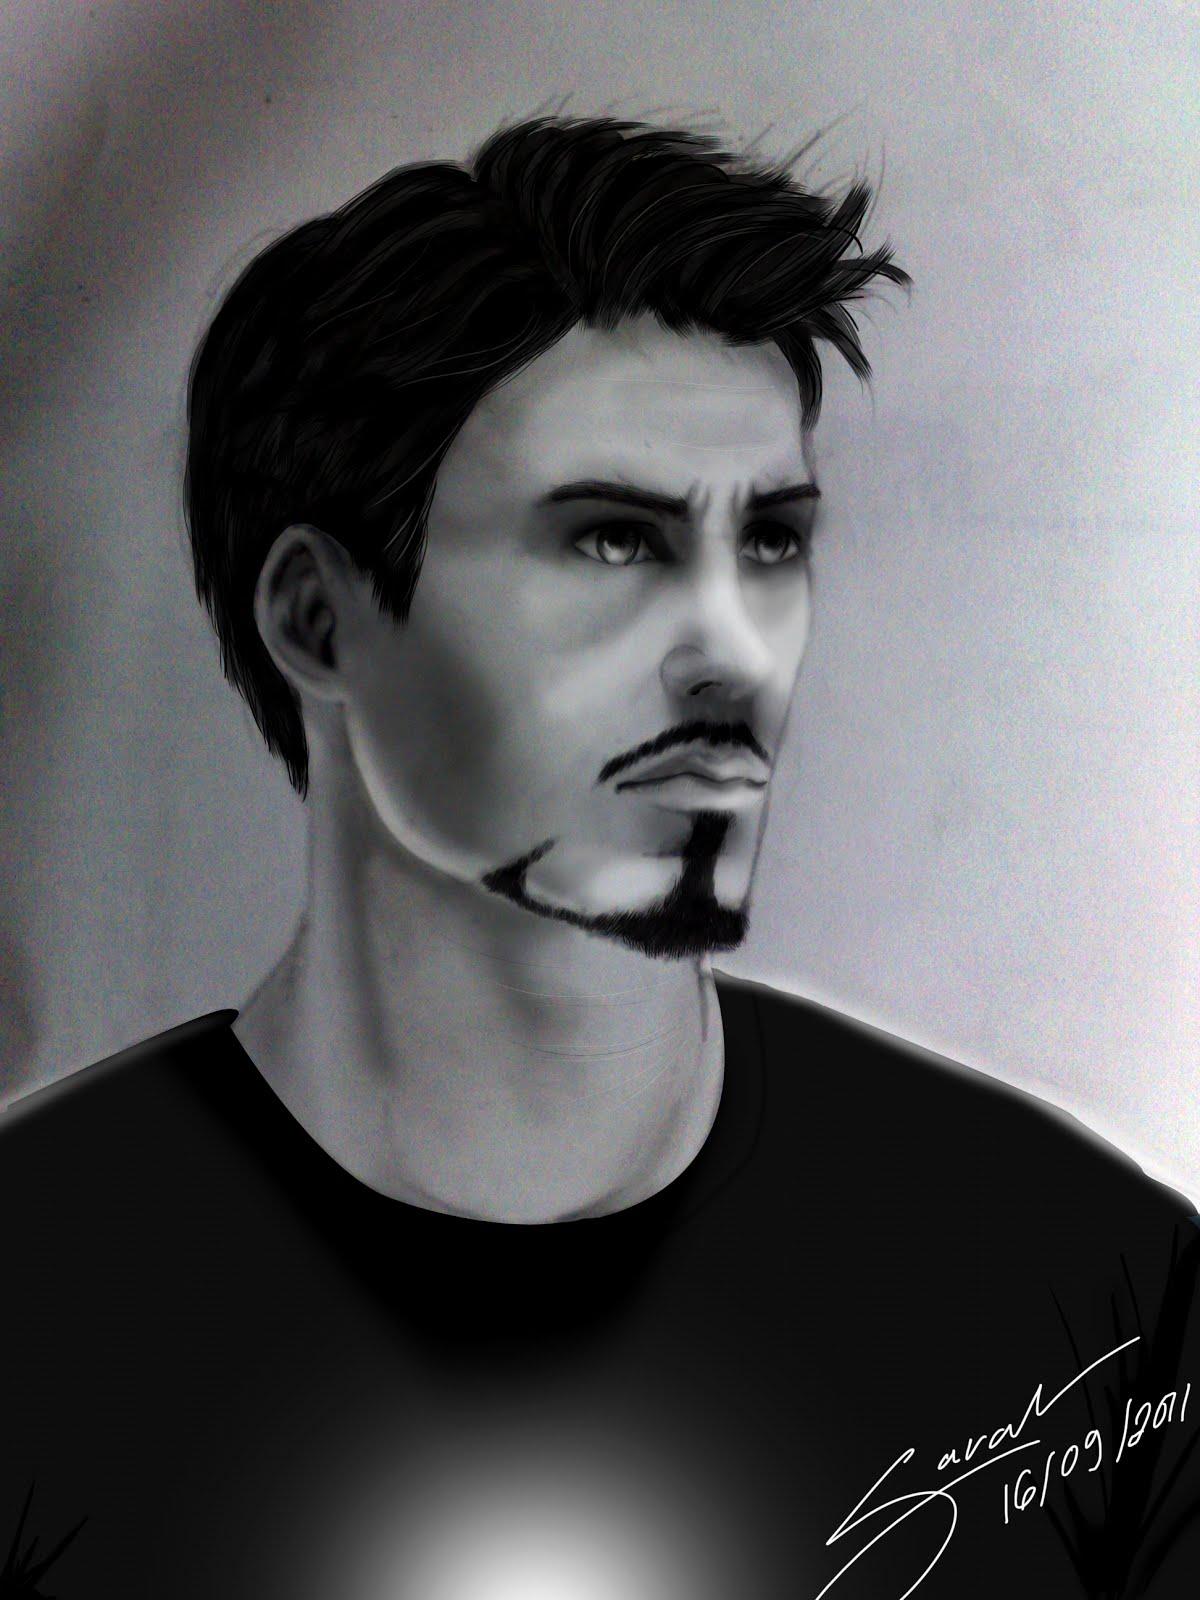 The Graphic Illusion Tony Stark Desenho 2011